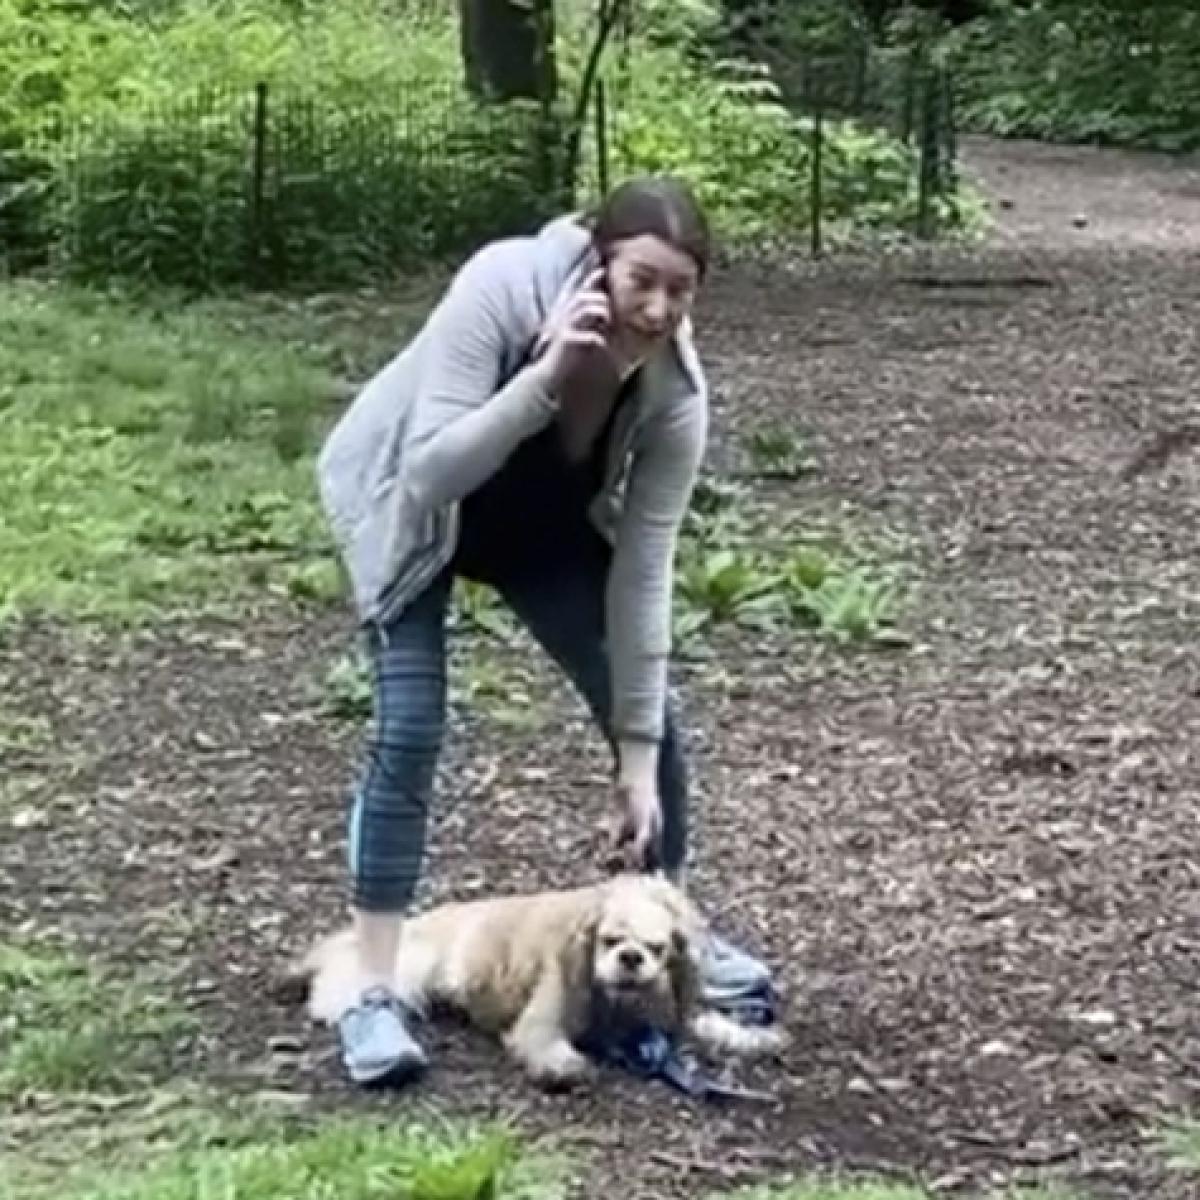 Central Park dog lady Amy 'Karen' Cooper fired from Franklin Templeton for calling cops on black man